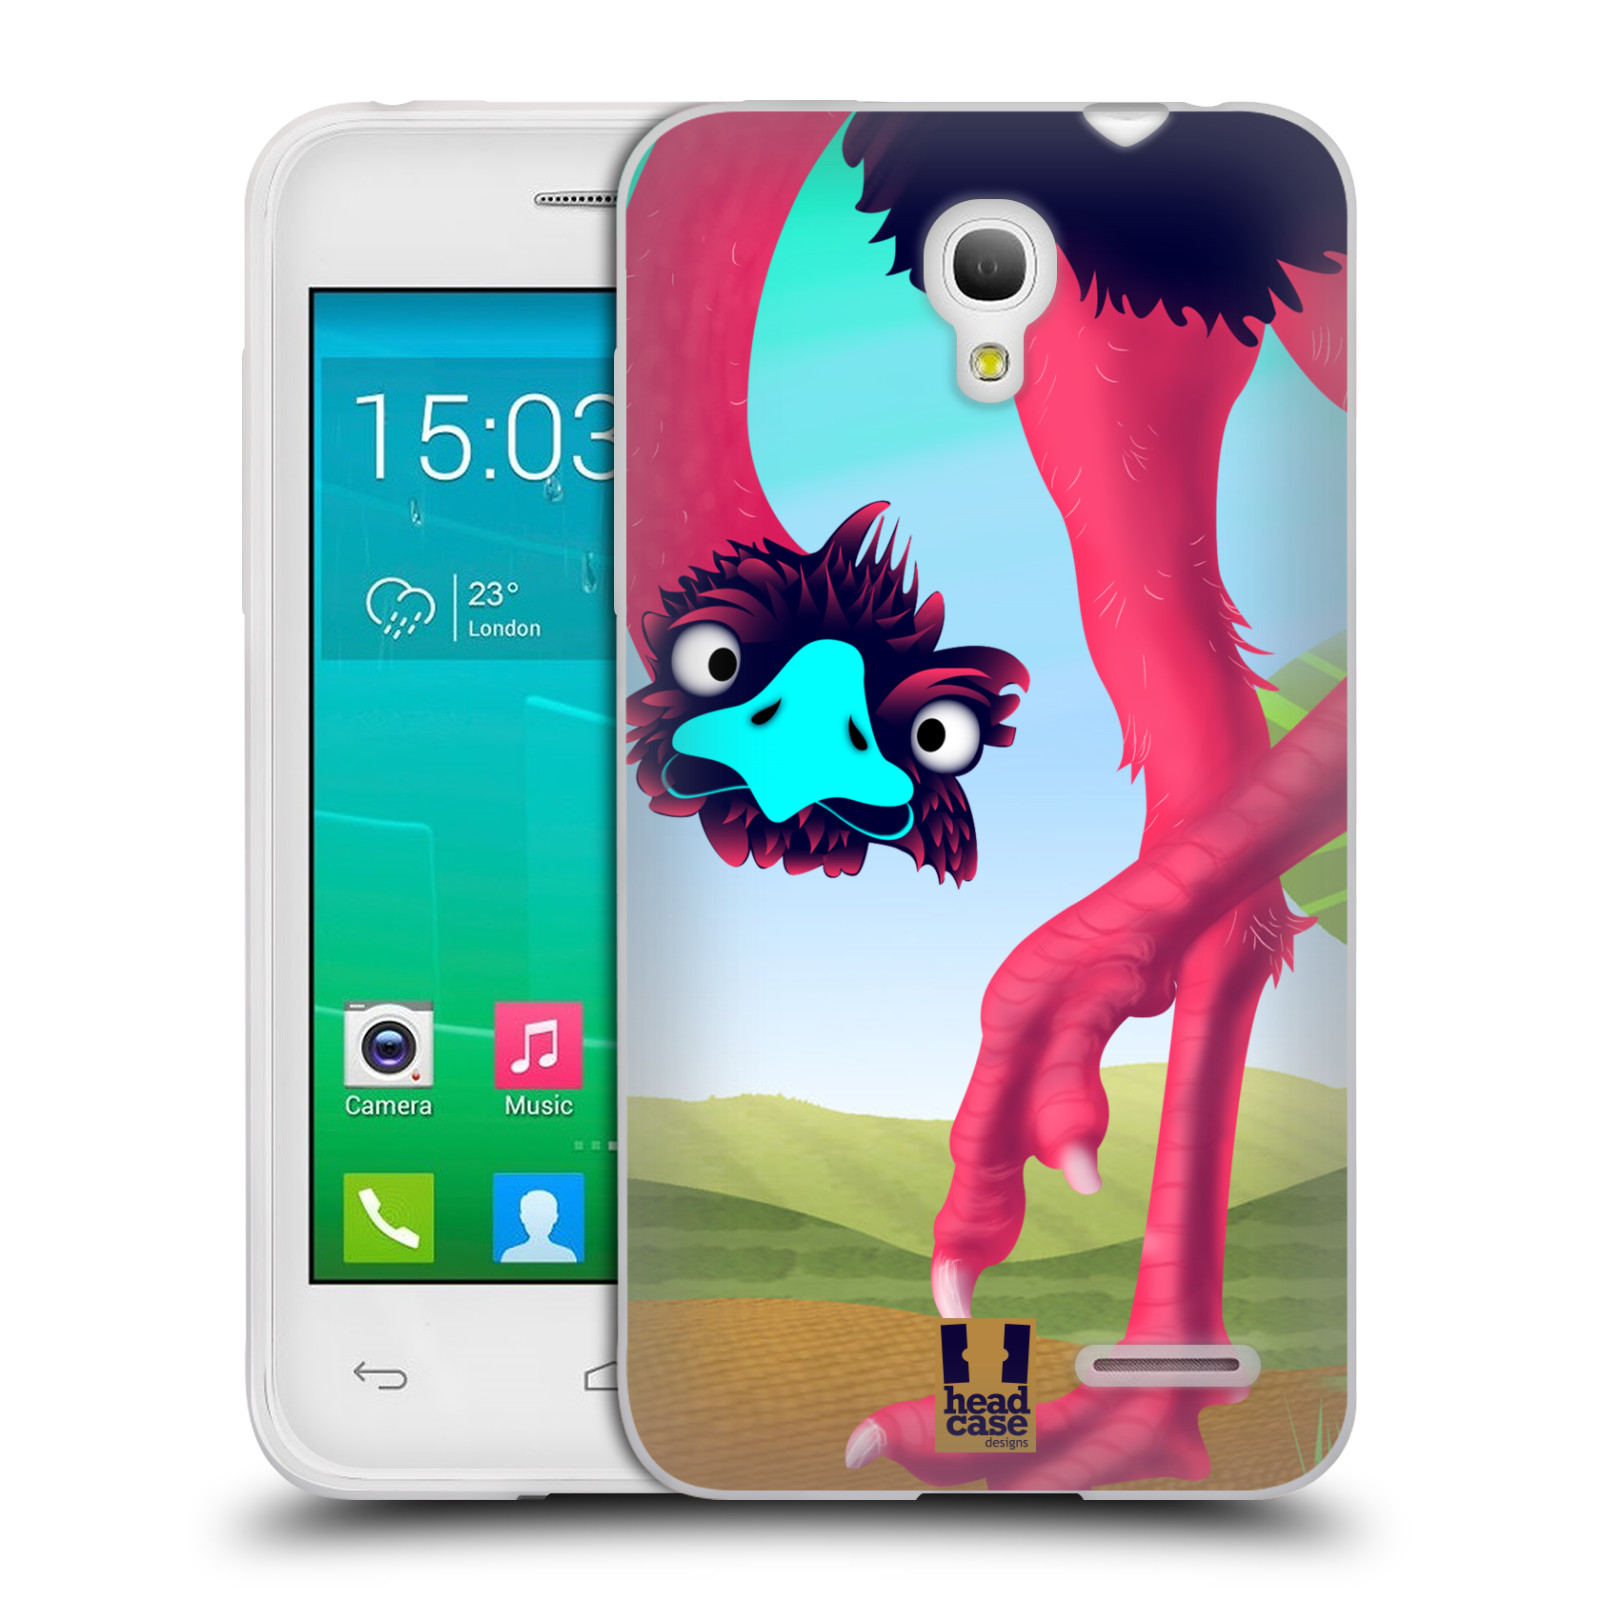 HEAD CASE silikonový obal na mobil Alcatel POP S3 OT-5050Y vzor dlouhé nohy kreslená zvířátka pštros